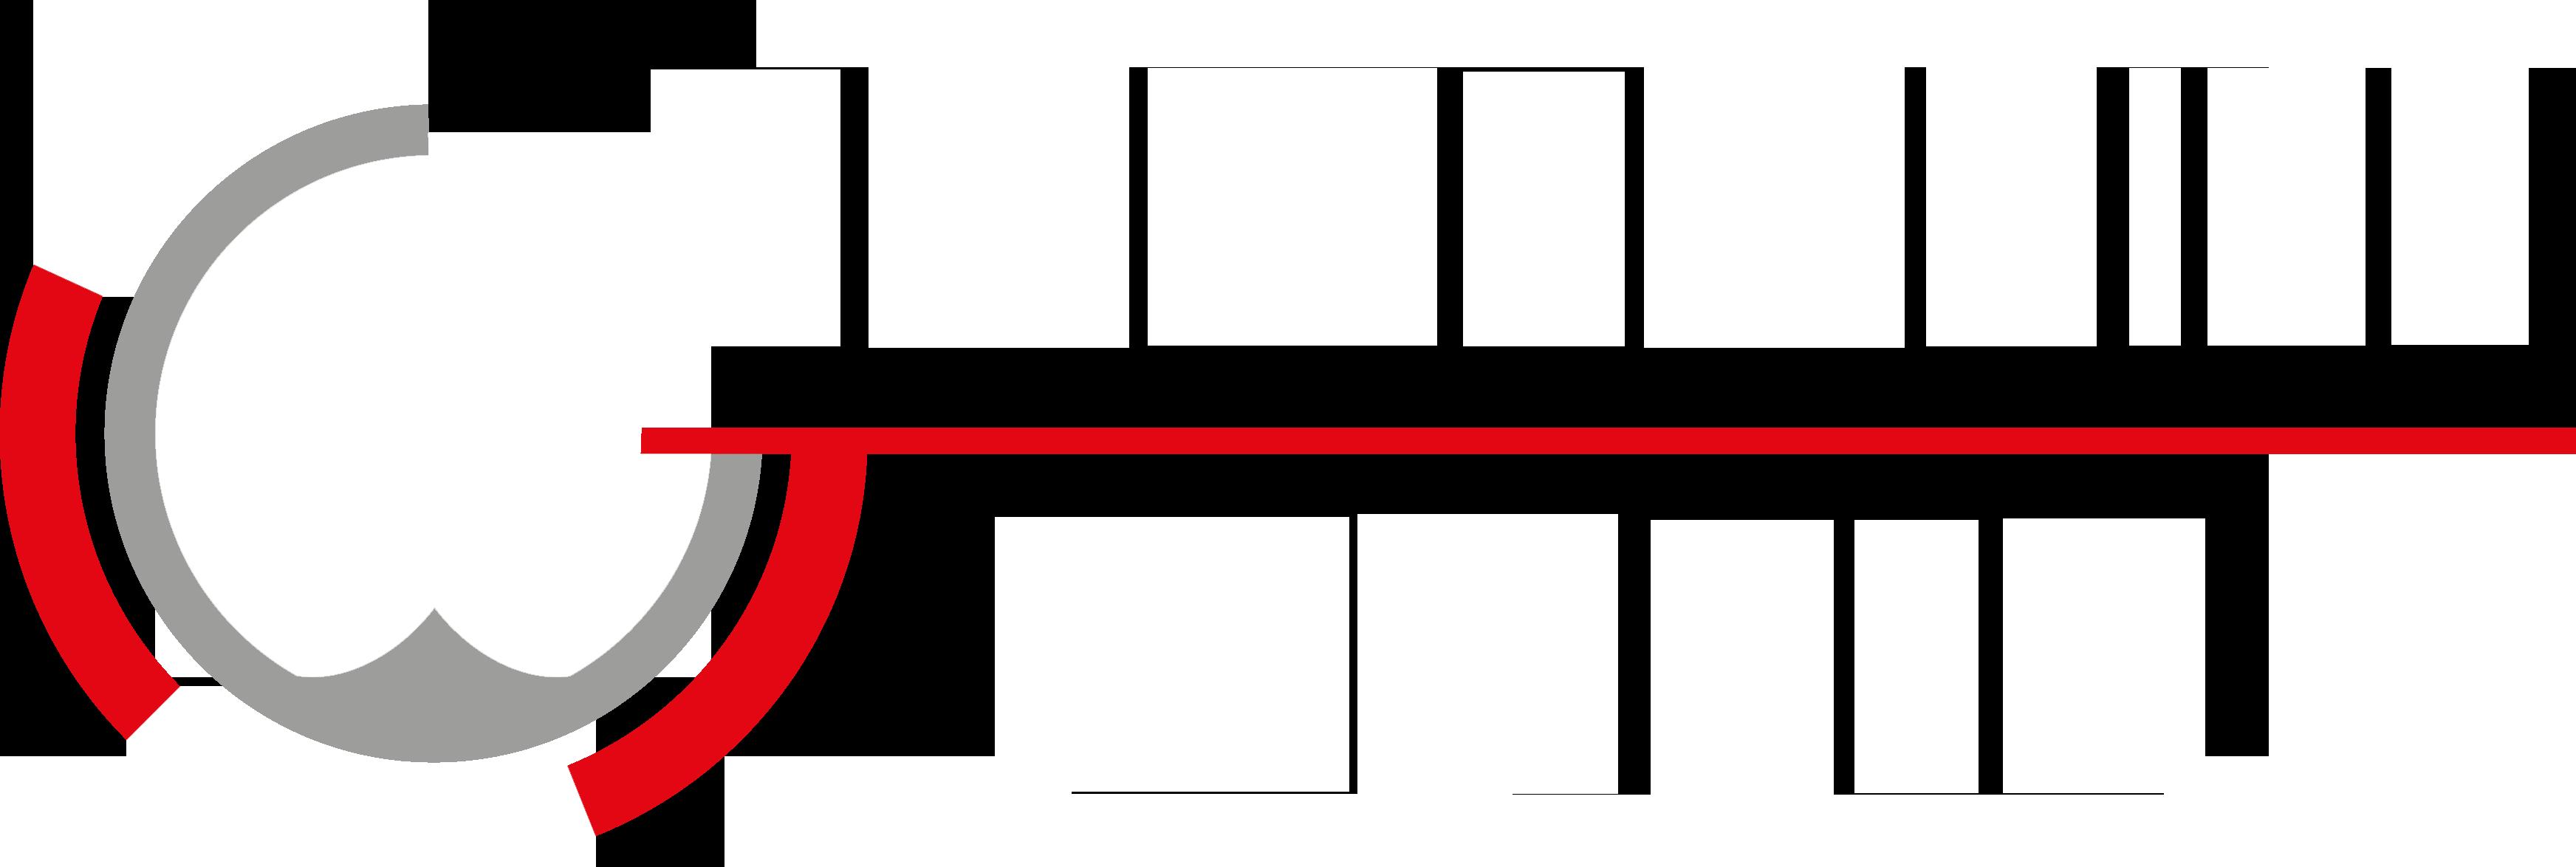 Composite World